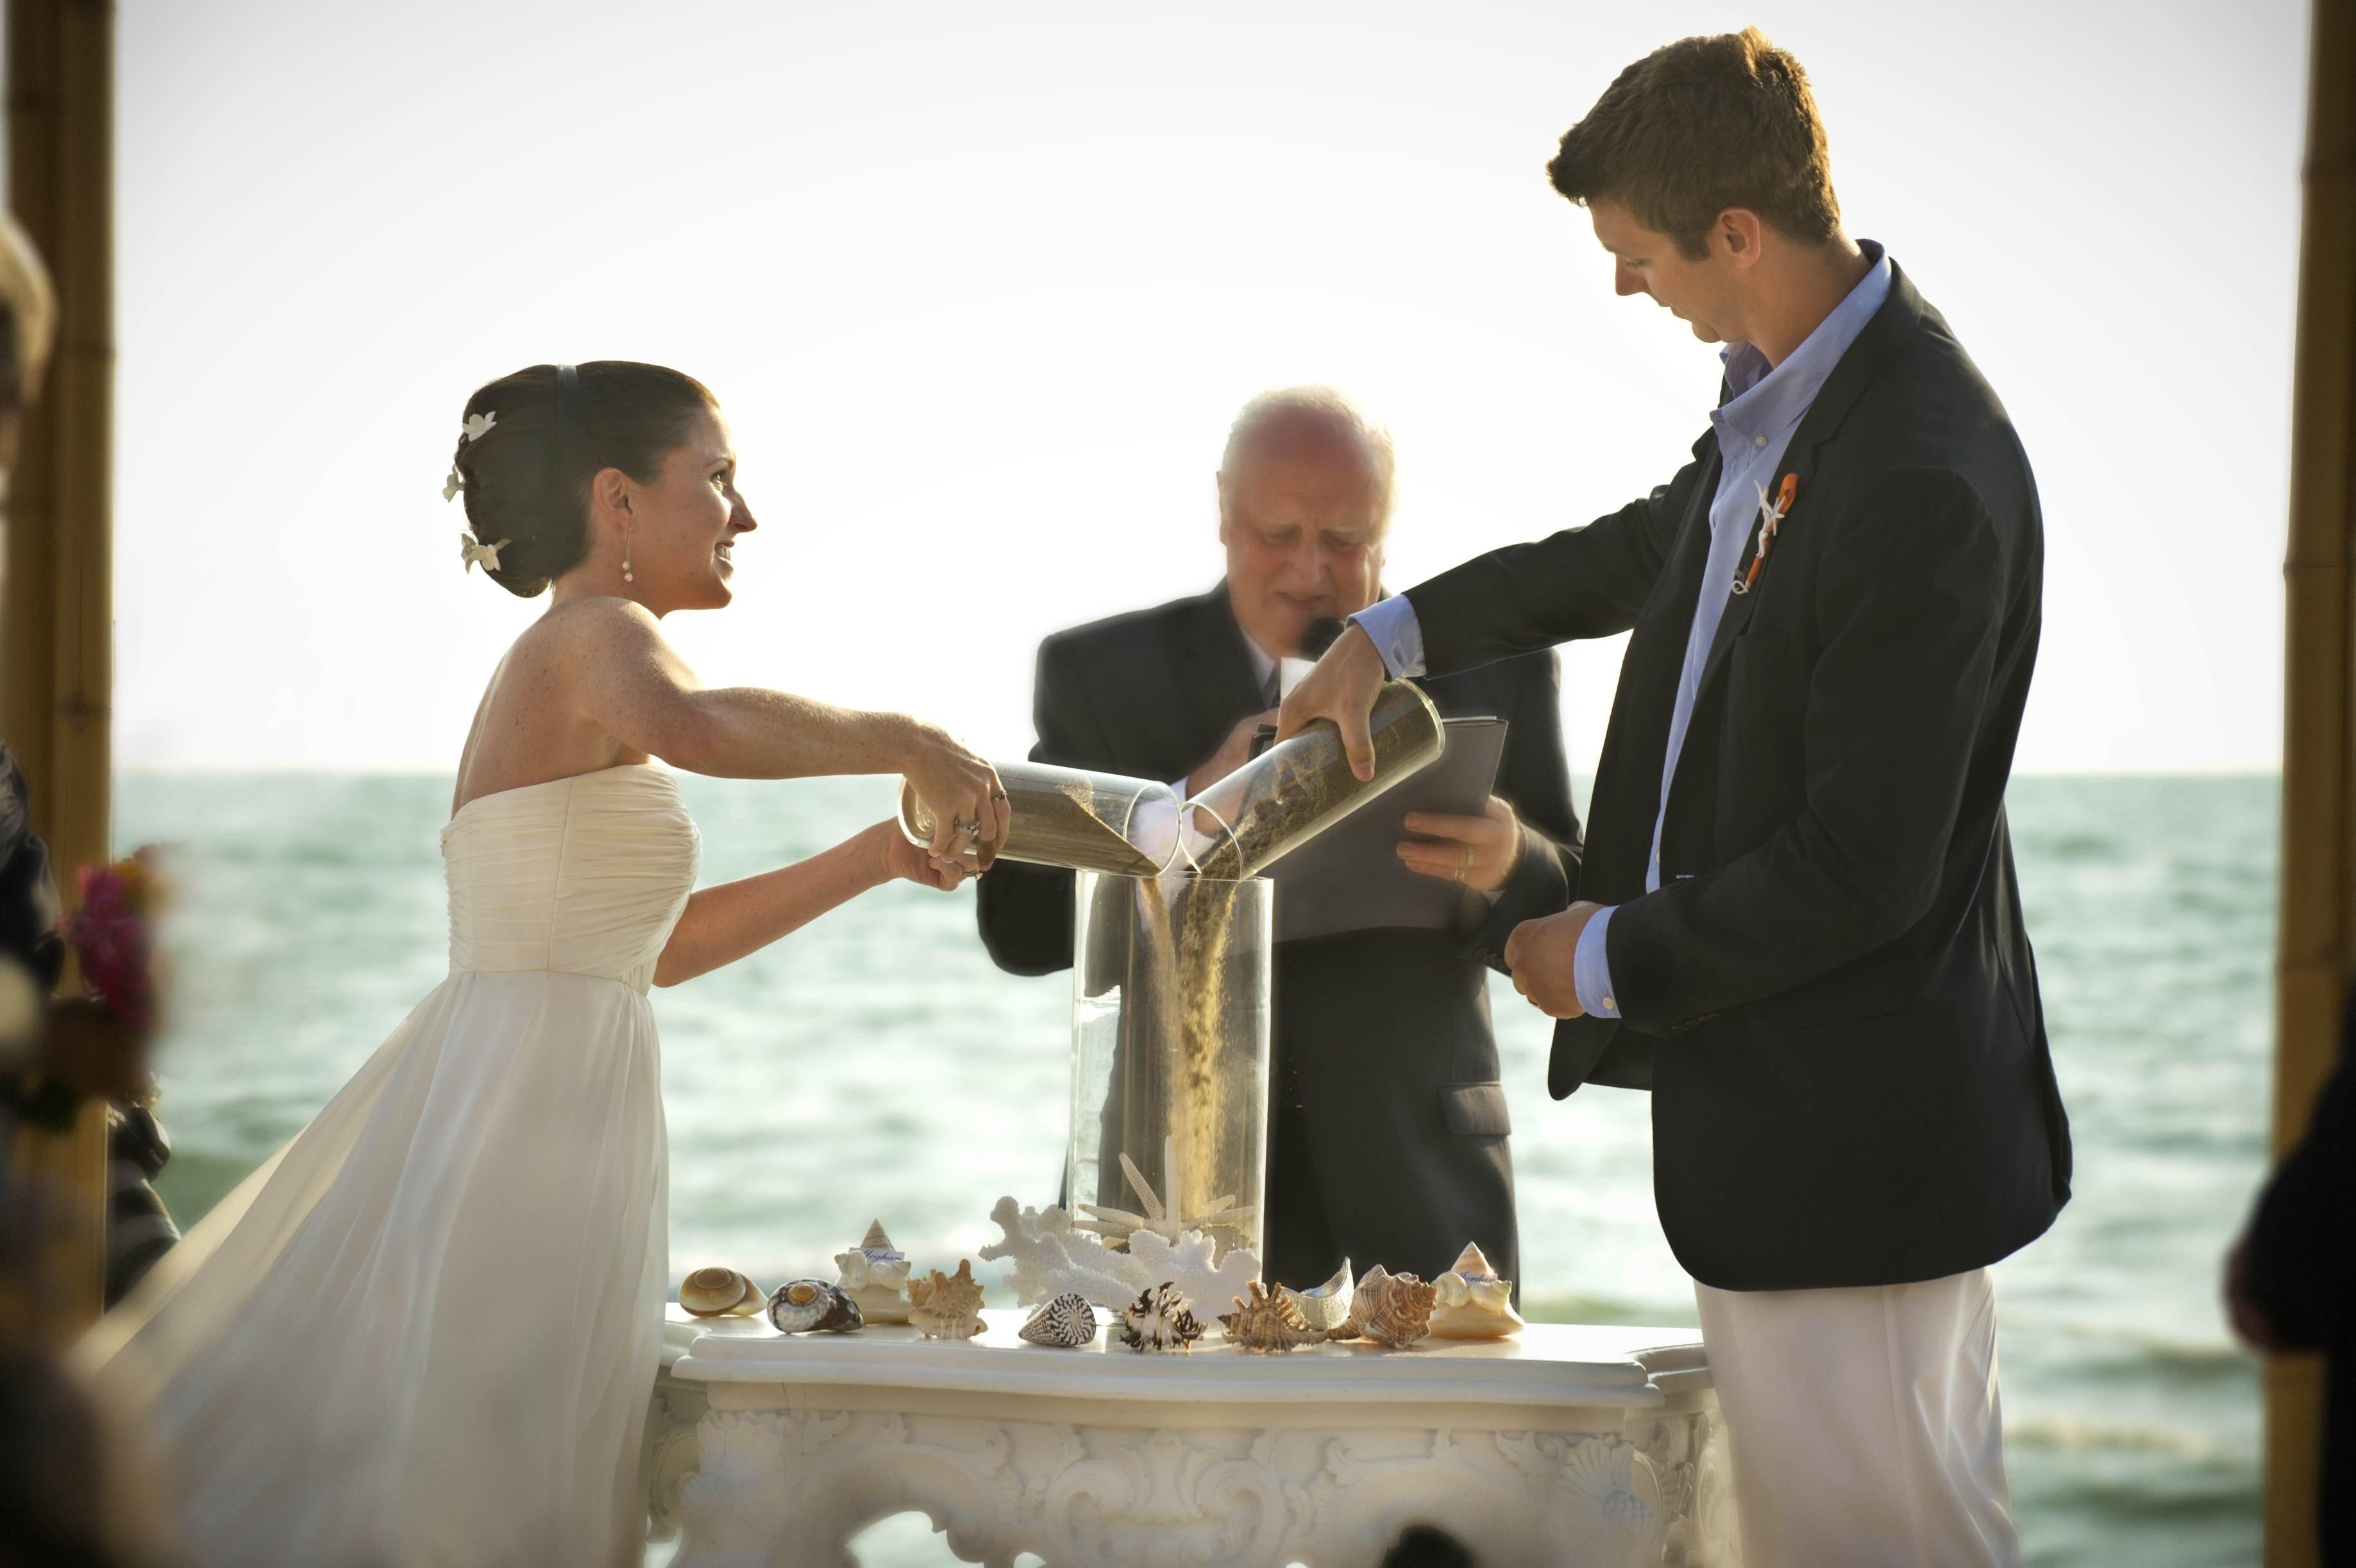 10 Stylish Wedding Ceremony Ideas Instead Of Unity Candle wedding ceremony ideas unity ceremonies for nuptials inside weddings 1 2021